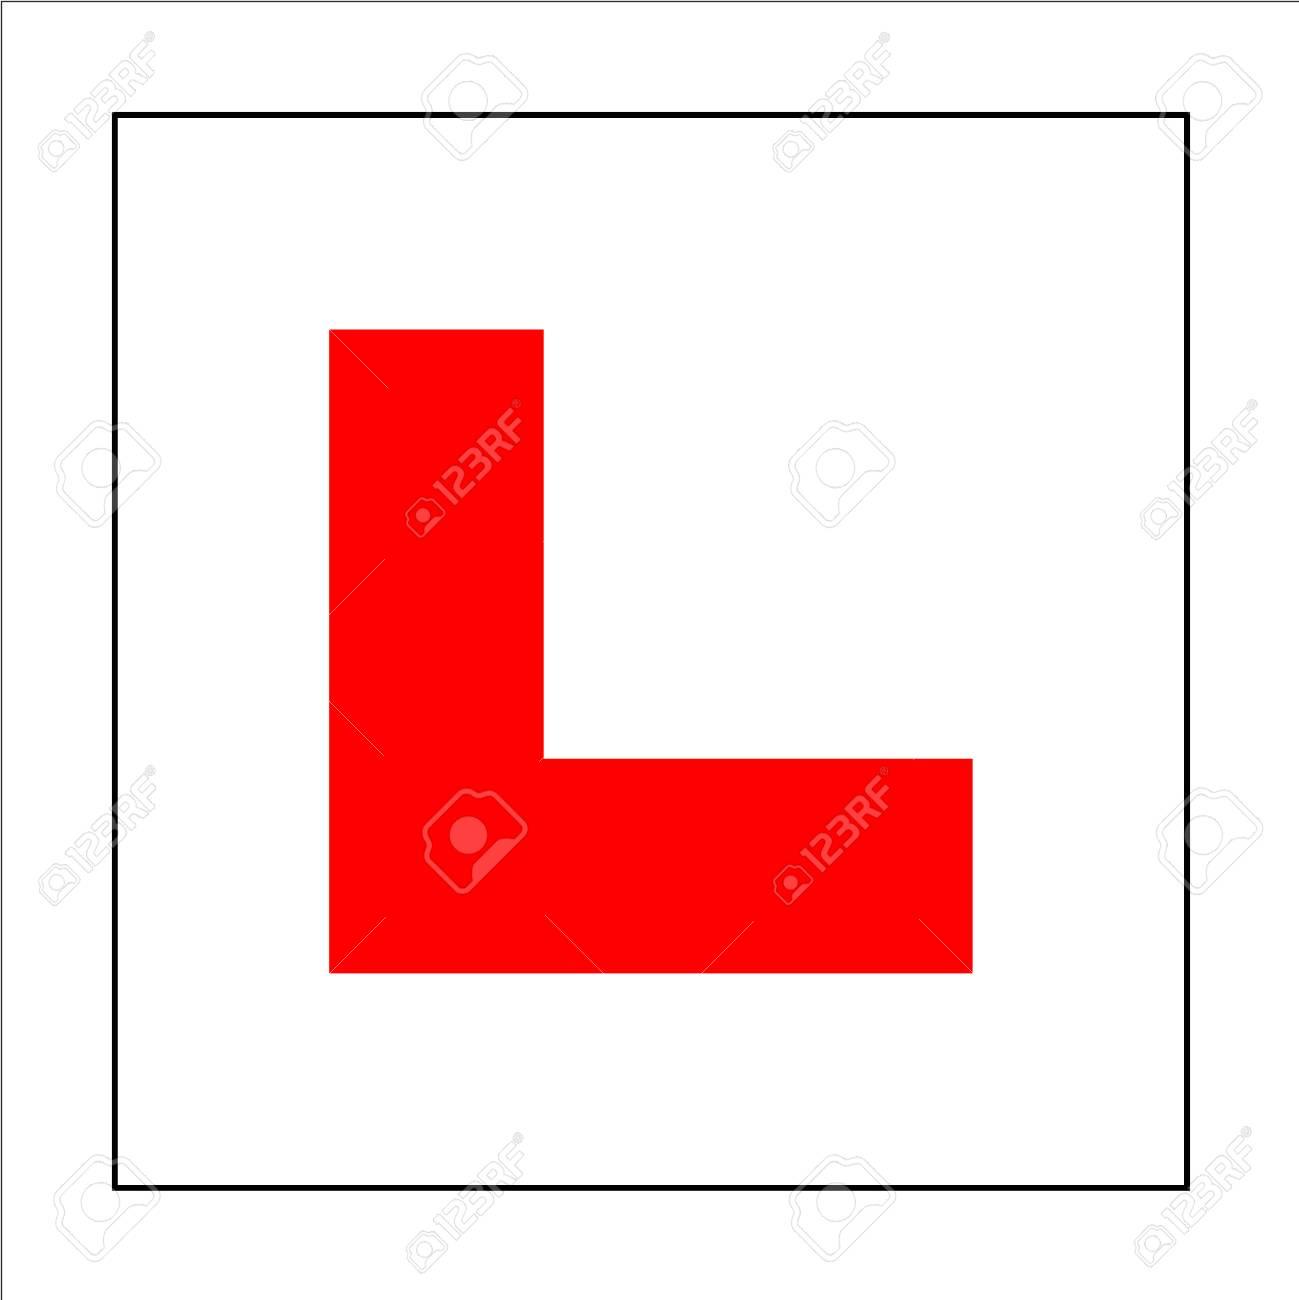 Learner driver plate sign. Car driving school beginner symbol. Red letter L  on square